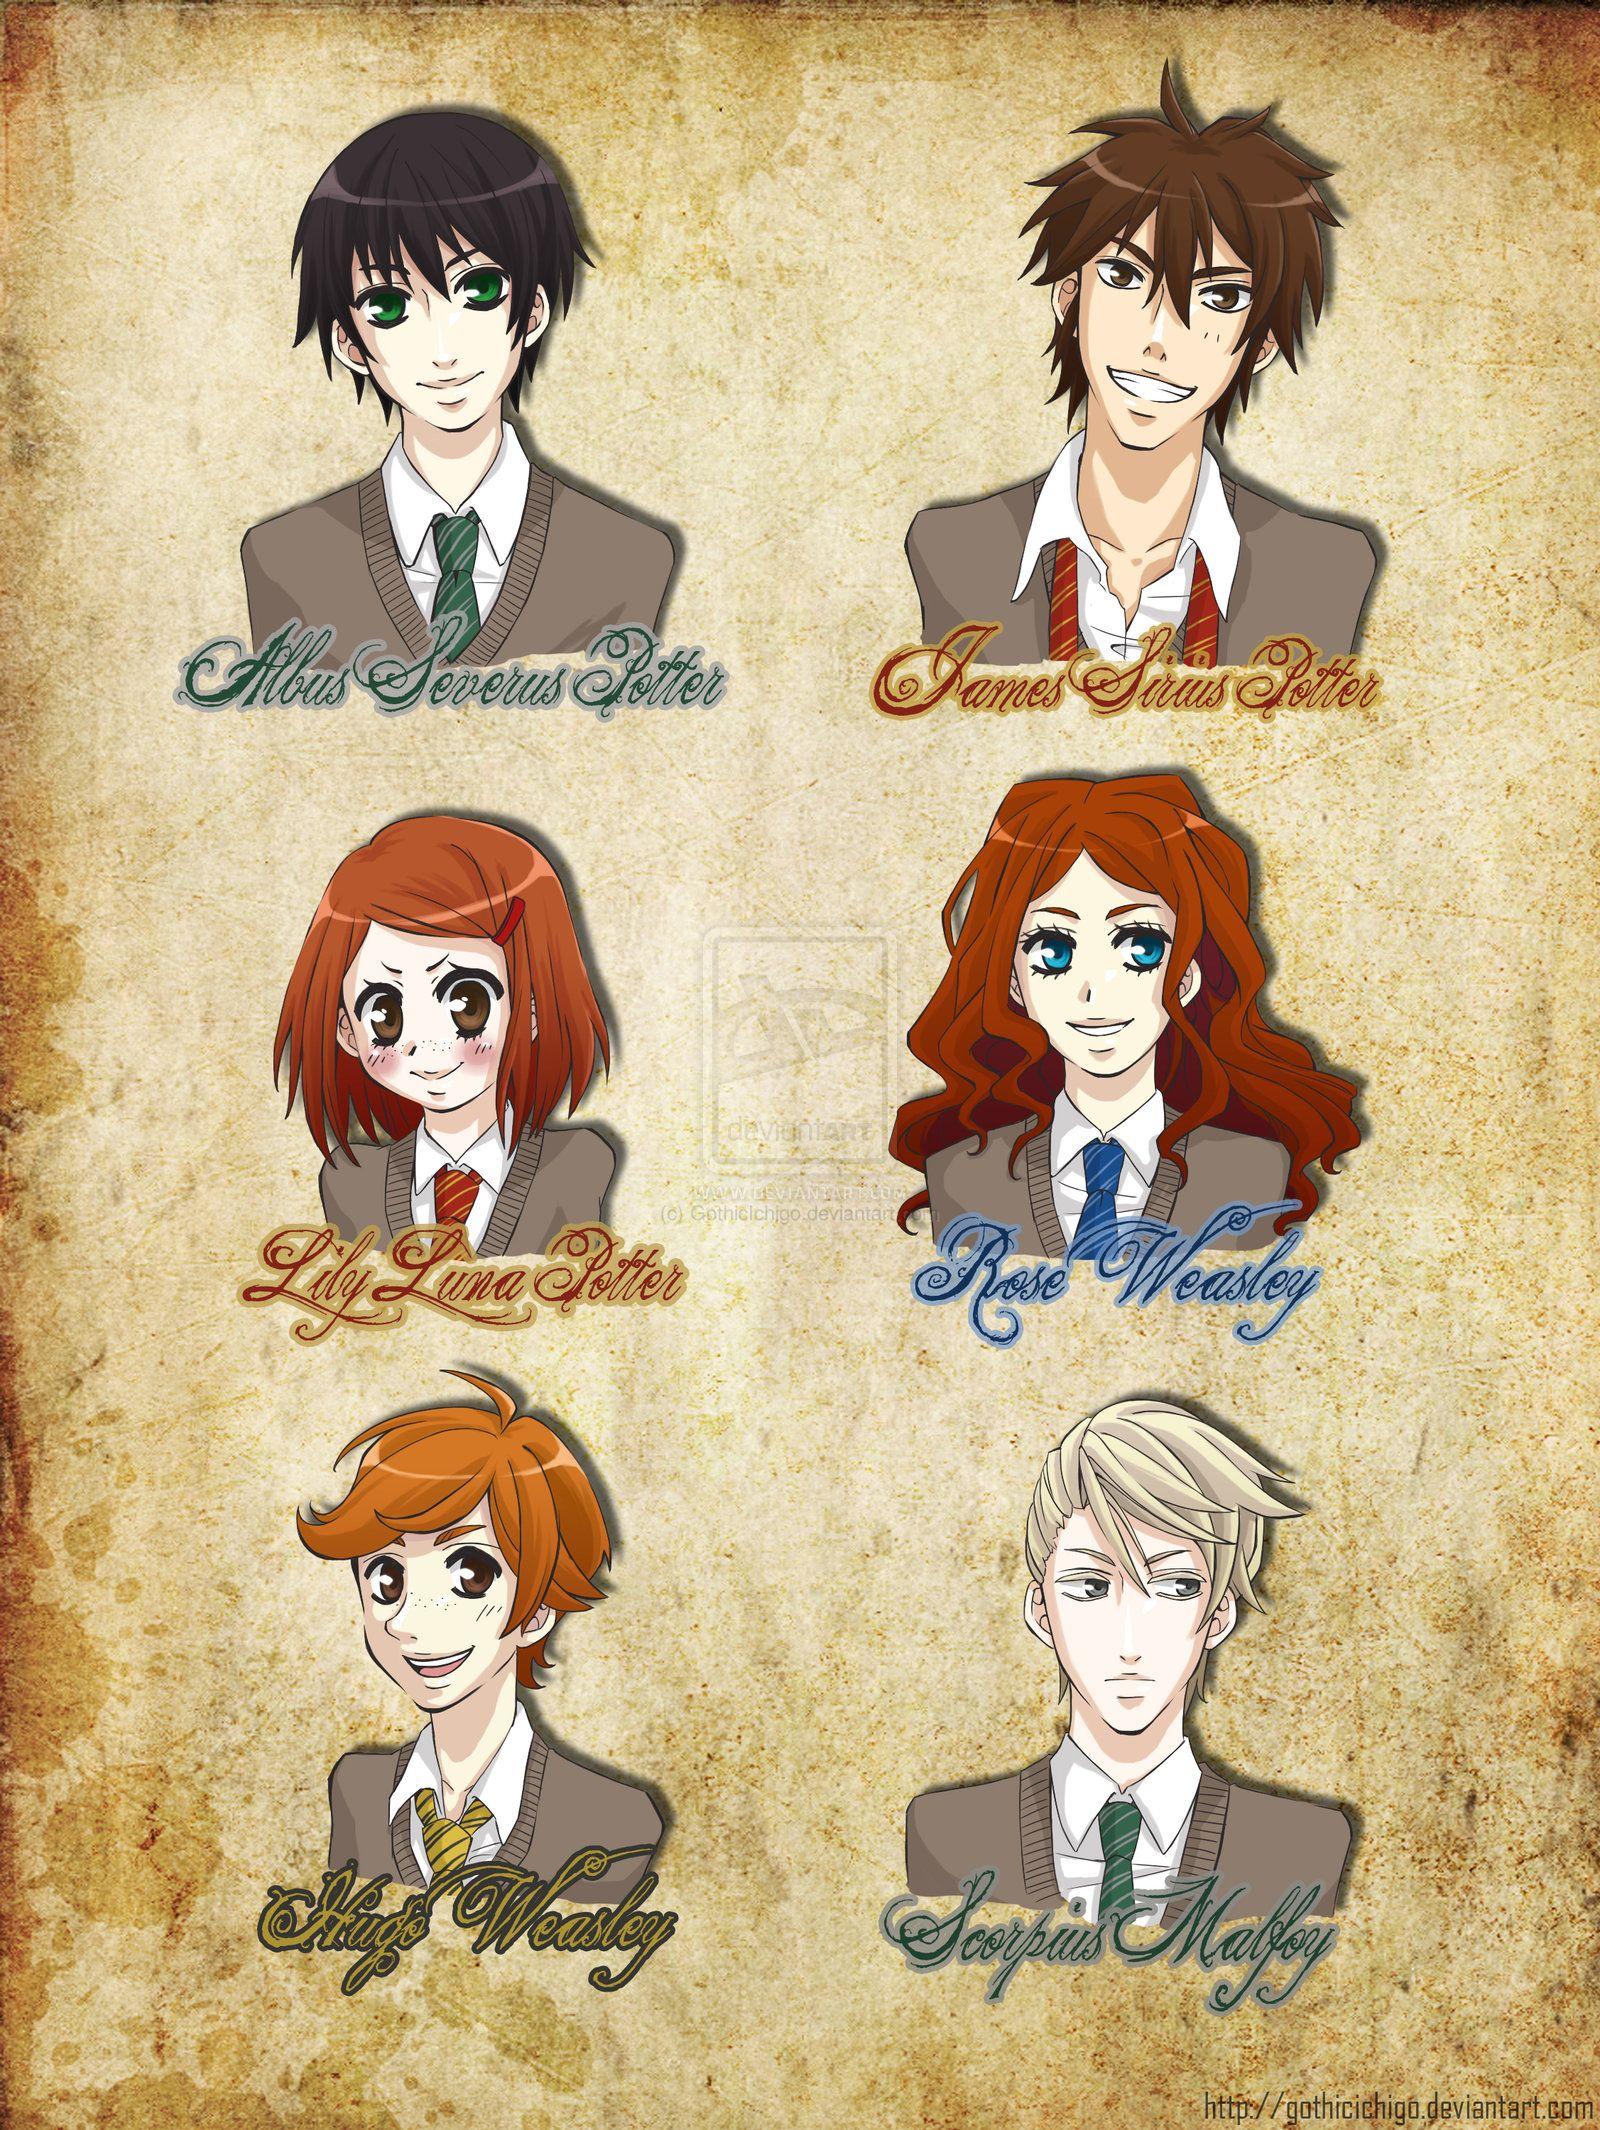 Hp Next Generation Pt1 By Gothicichigo On Deviantart Harry Potter Funny Harry Potter Art Harry Potter Music